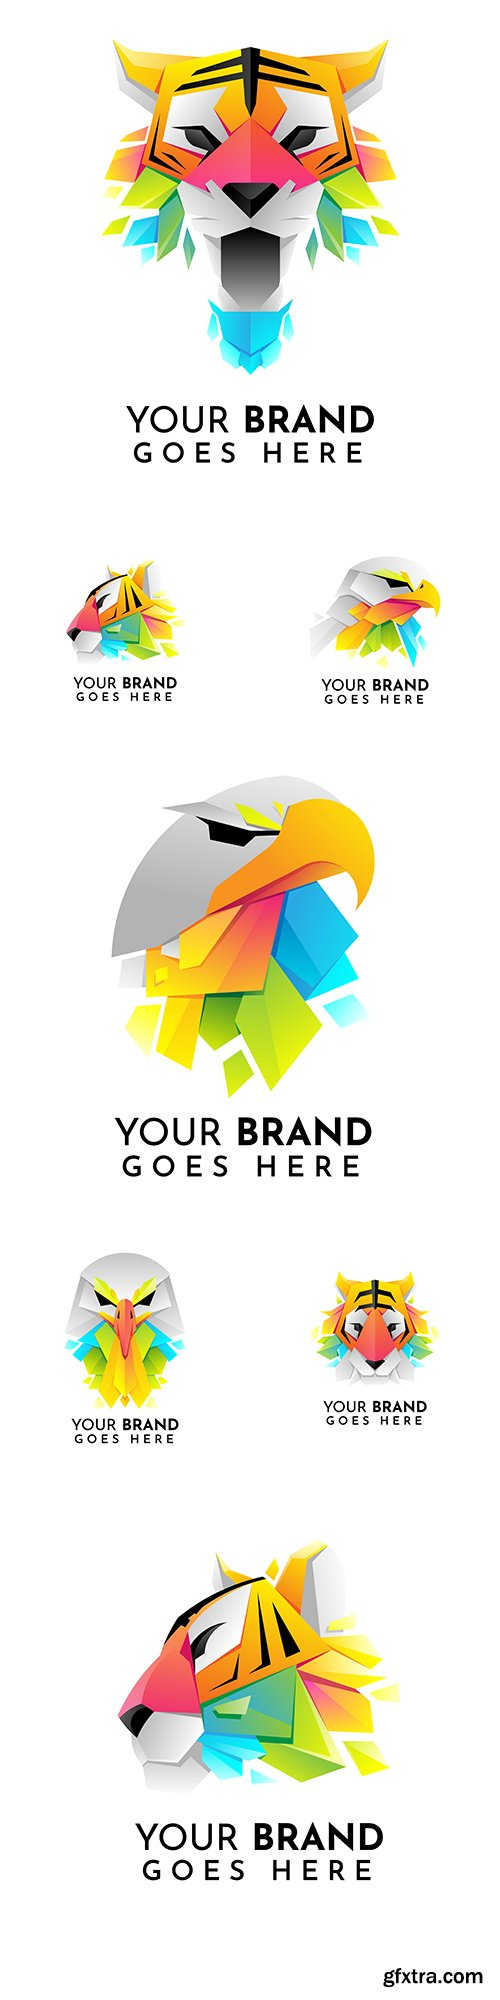 Eagle and tiger bright design logo illustration